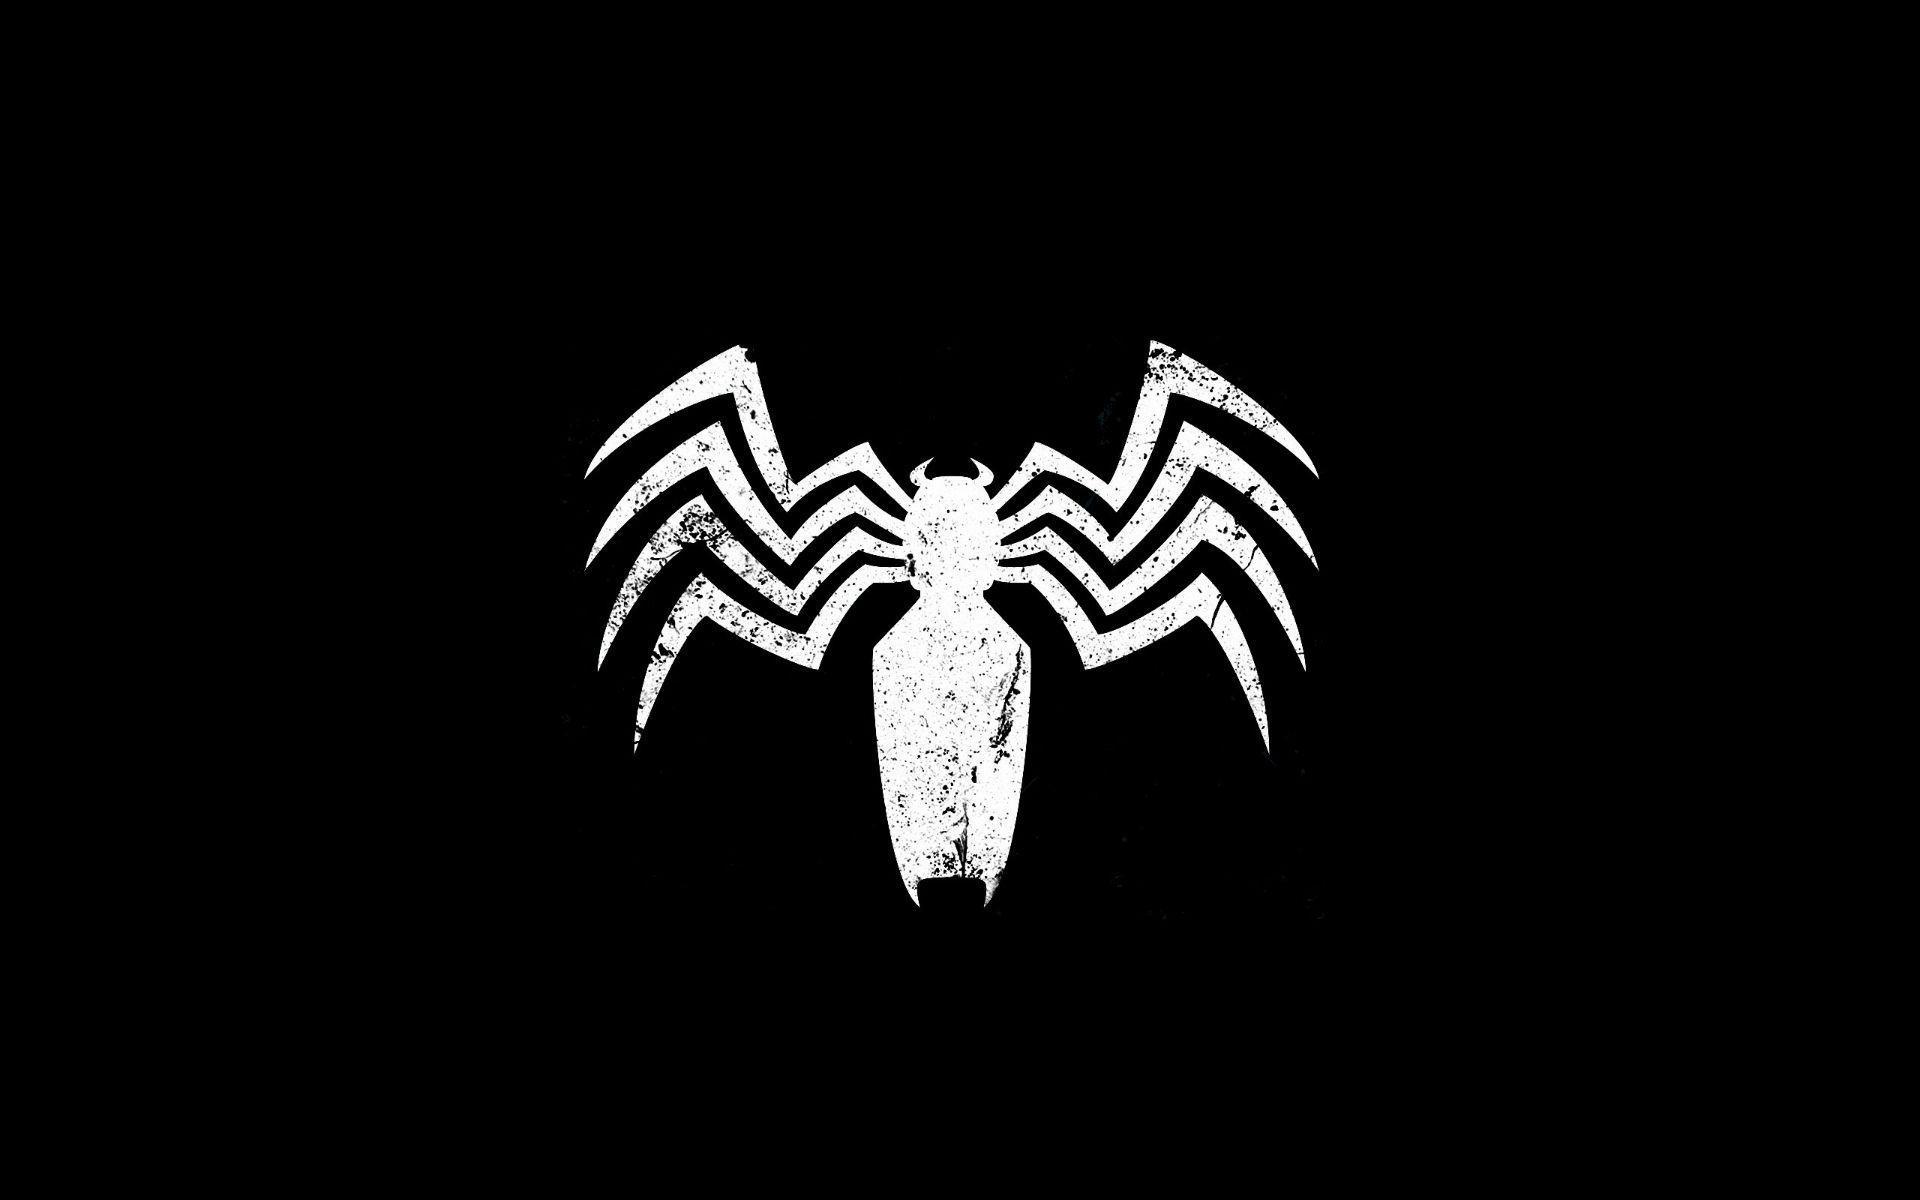 Black Spiderman Wallpapers - Wallpaper Cave